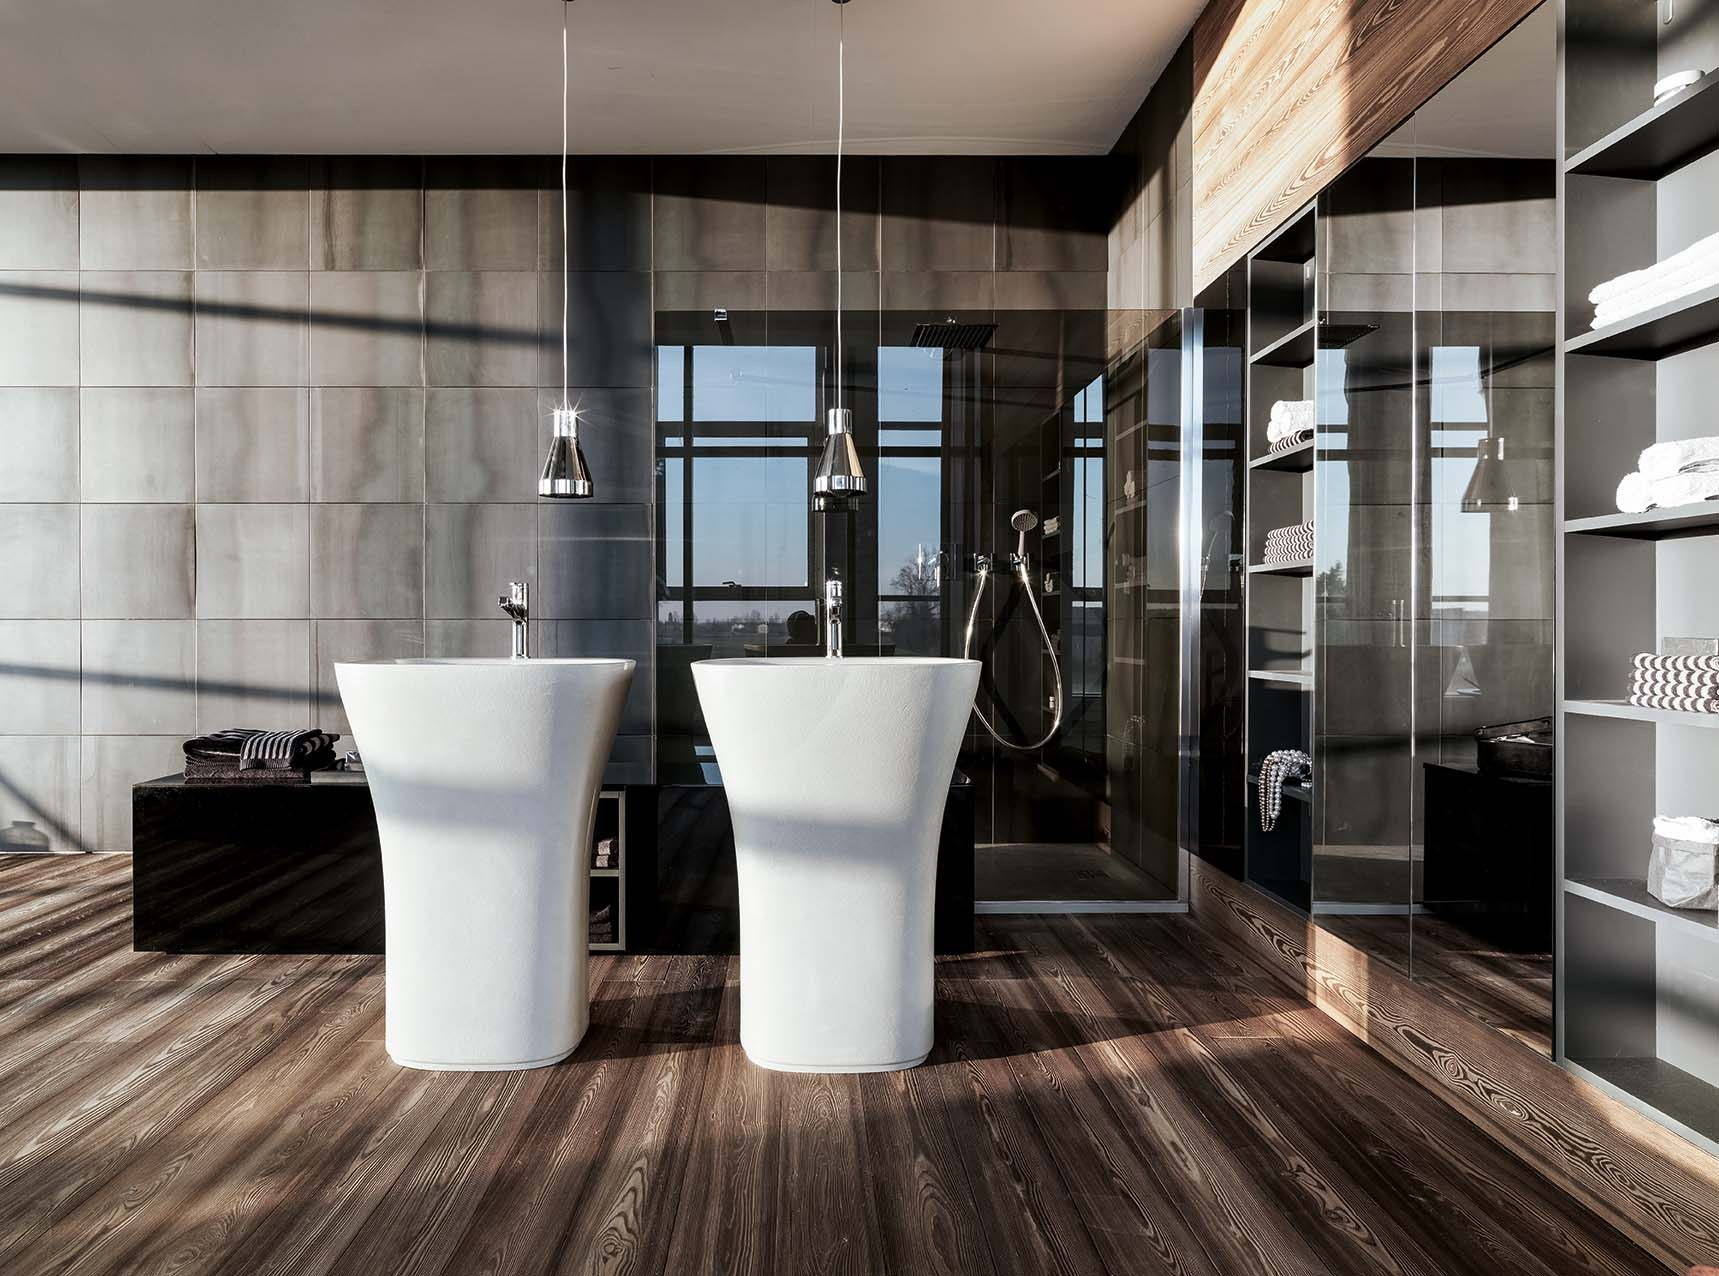 Atelier Via Veneto by Falper Design. Freestanding Scoop washbasins.